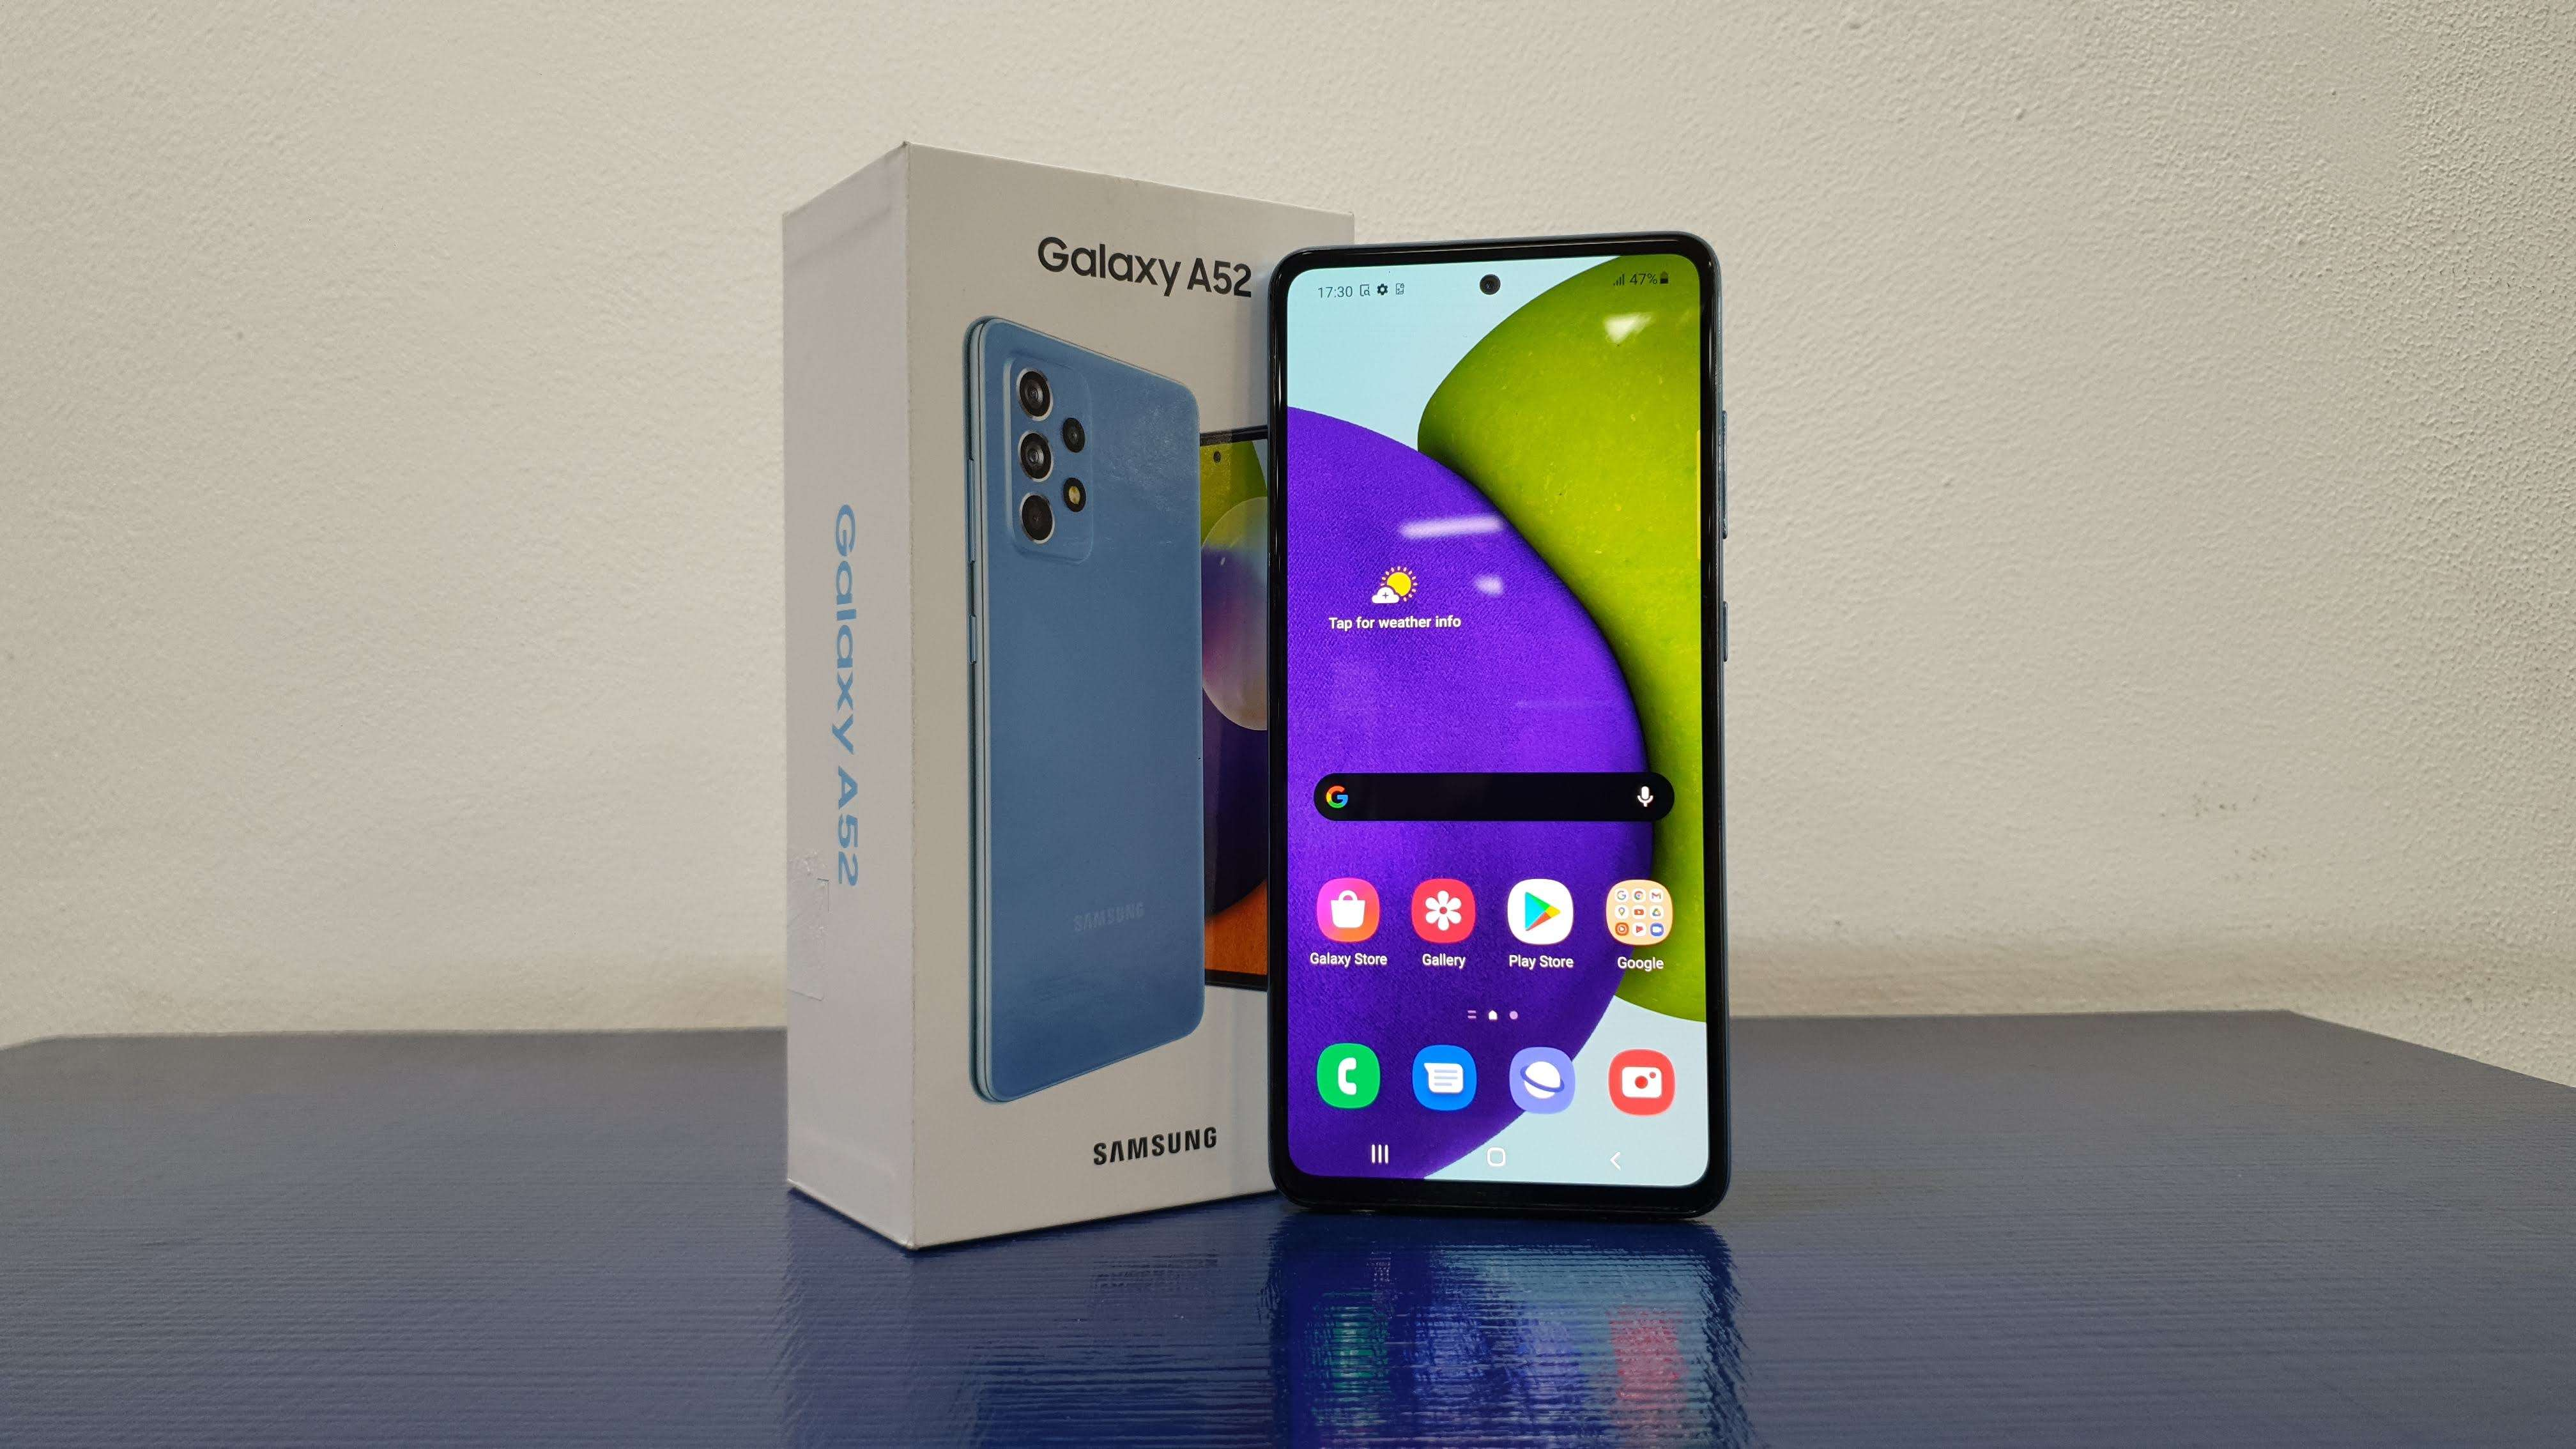 Samsung Galaxy A52 first look